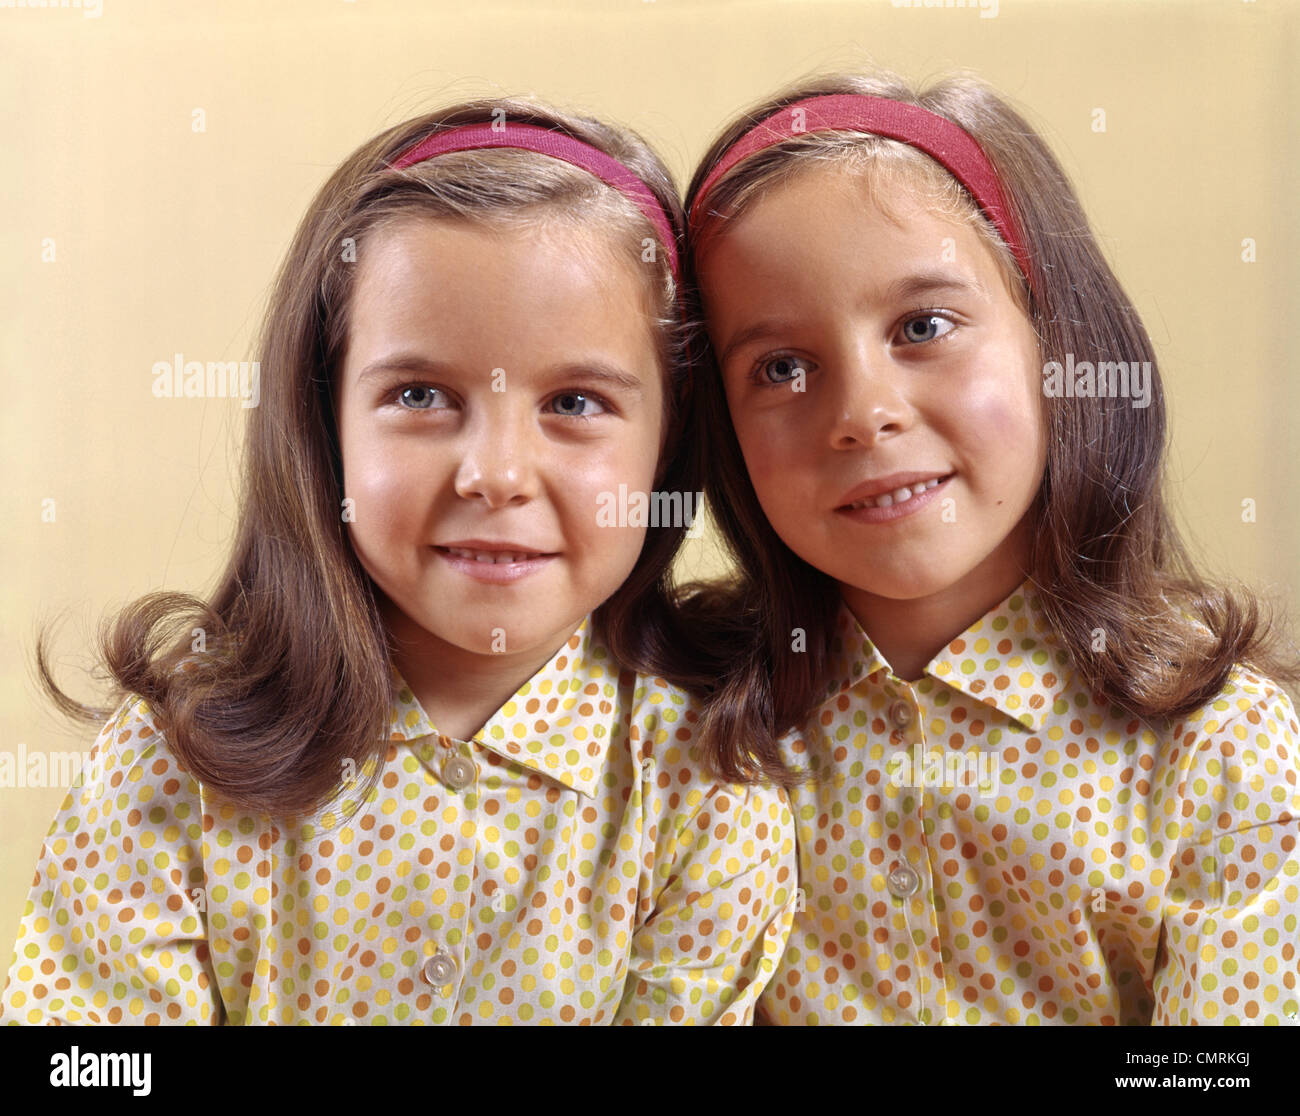 1970 1970 gemelos hermanas sonrisa Polka Dot Imagen De Stock